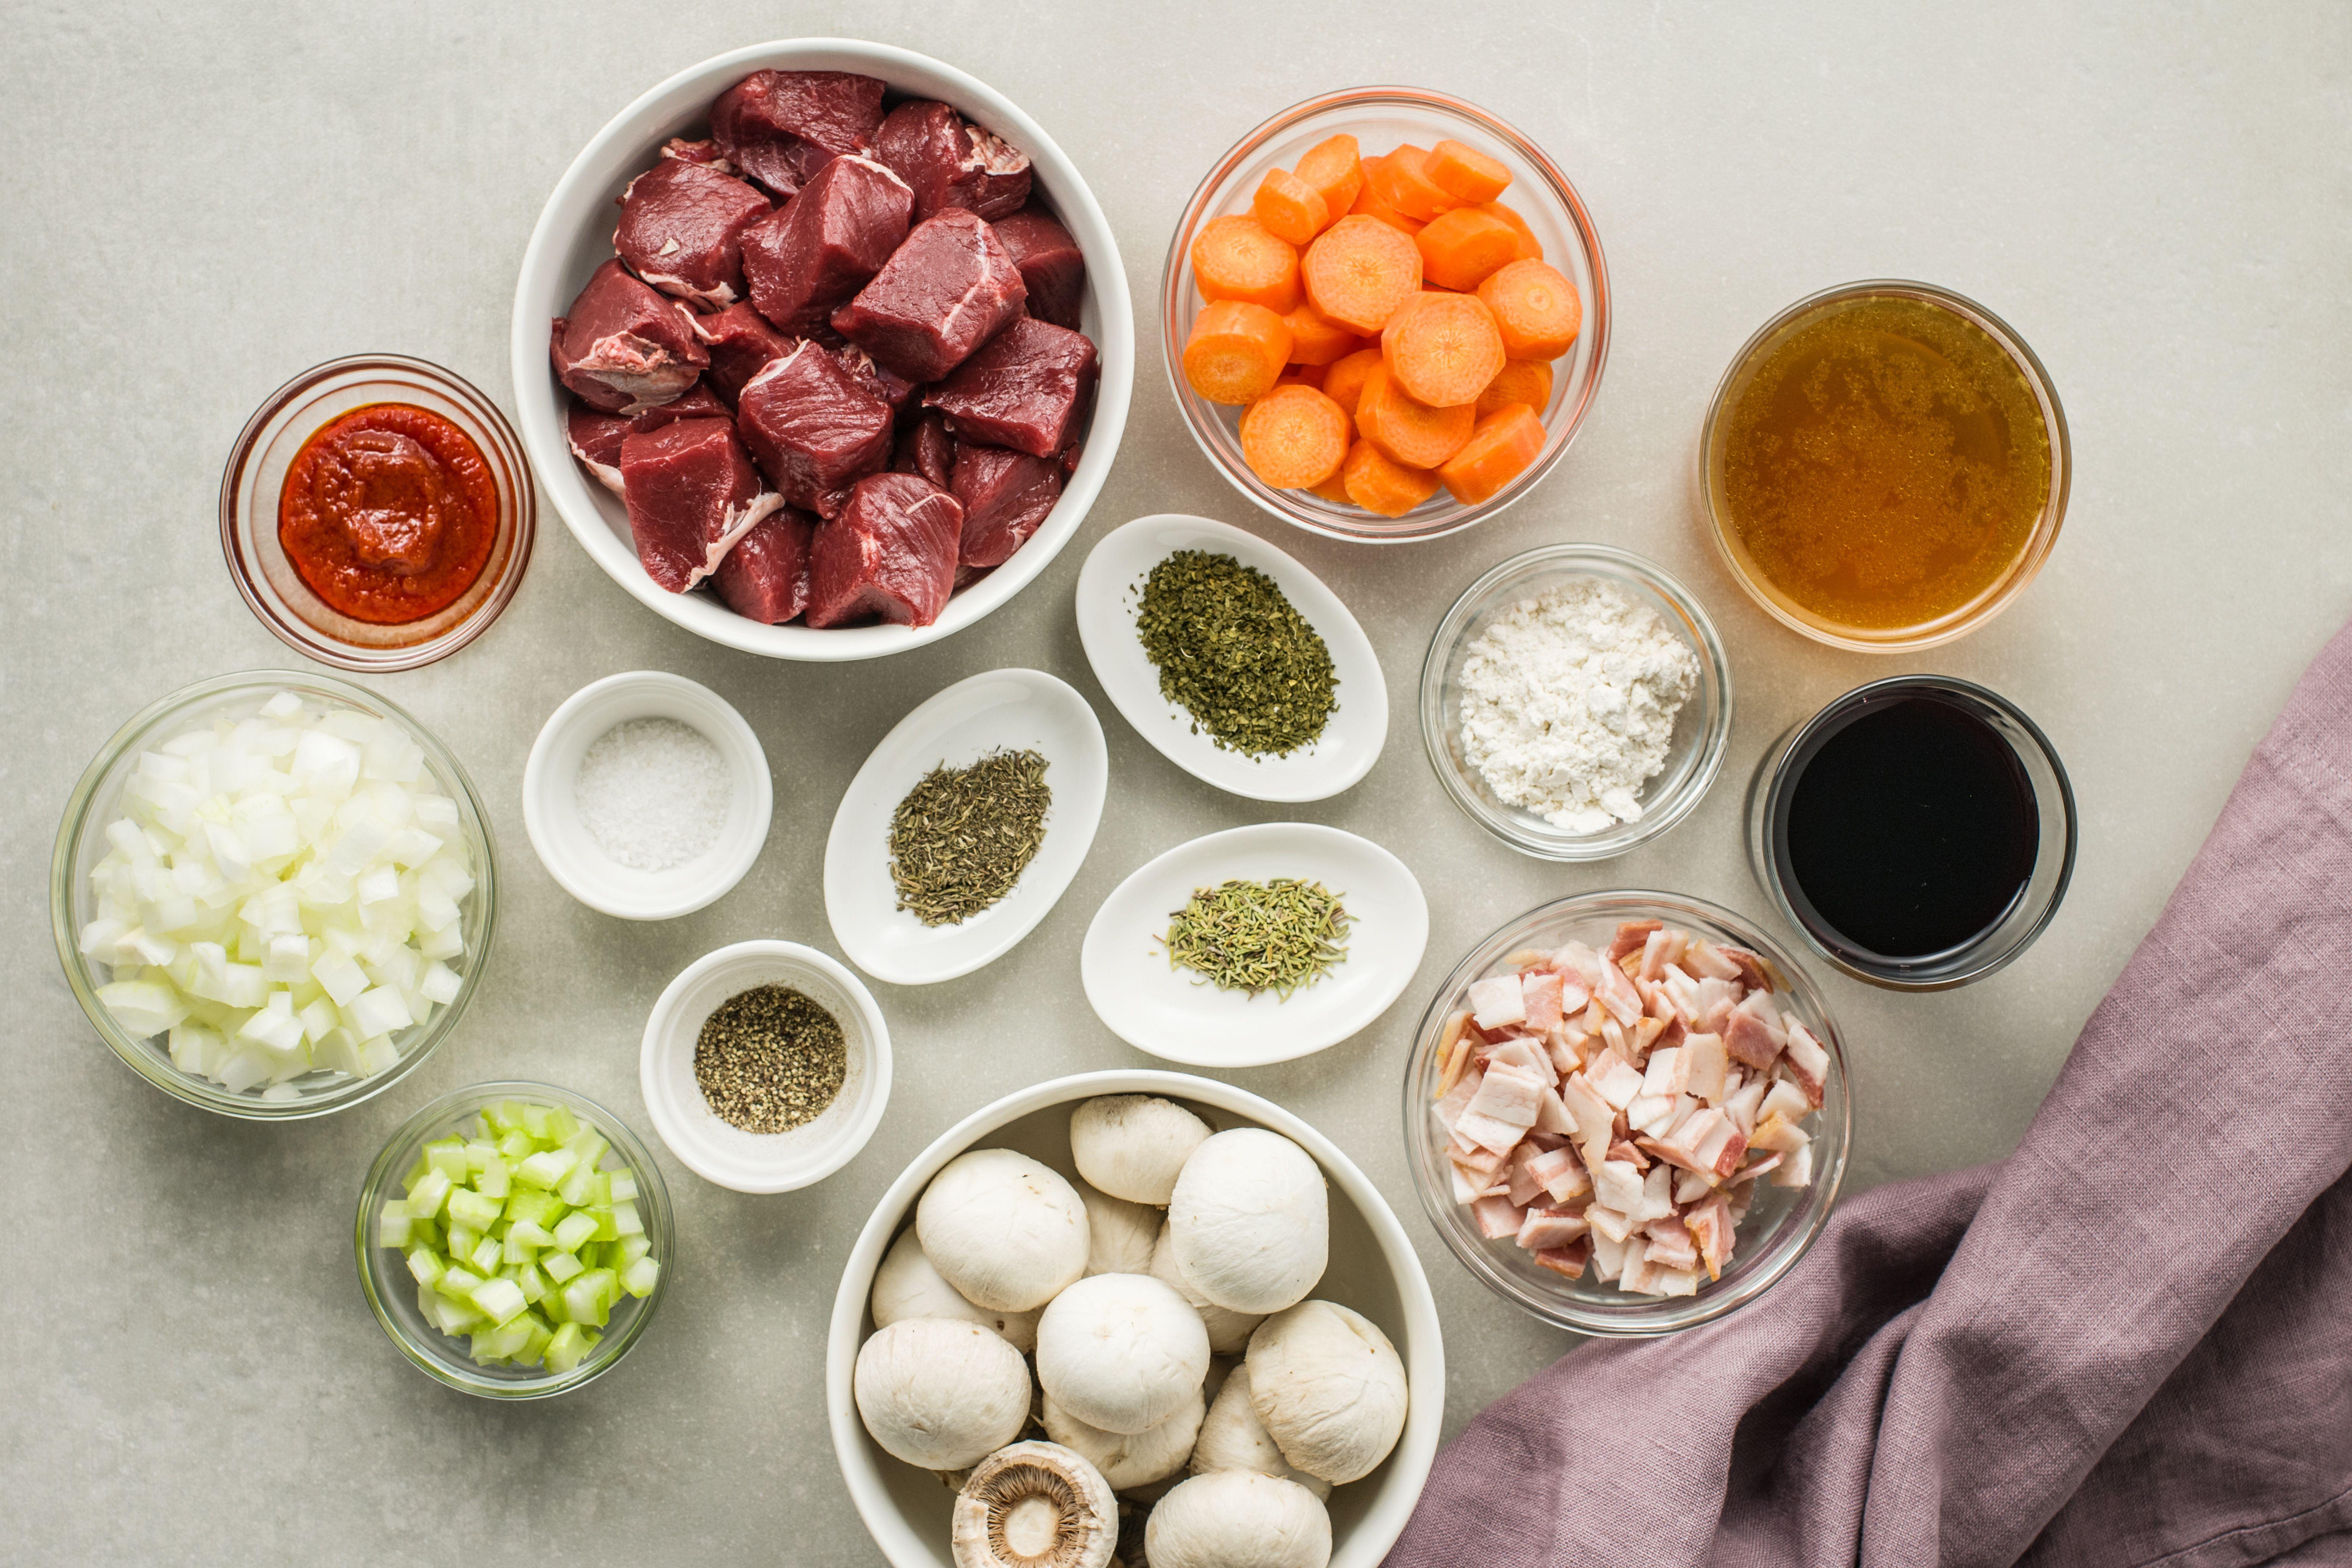 Ingredients for venison stew